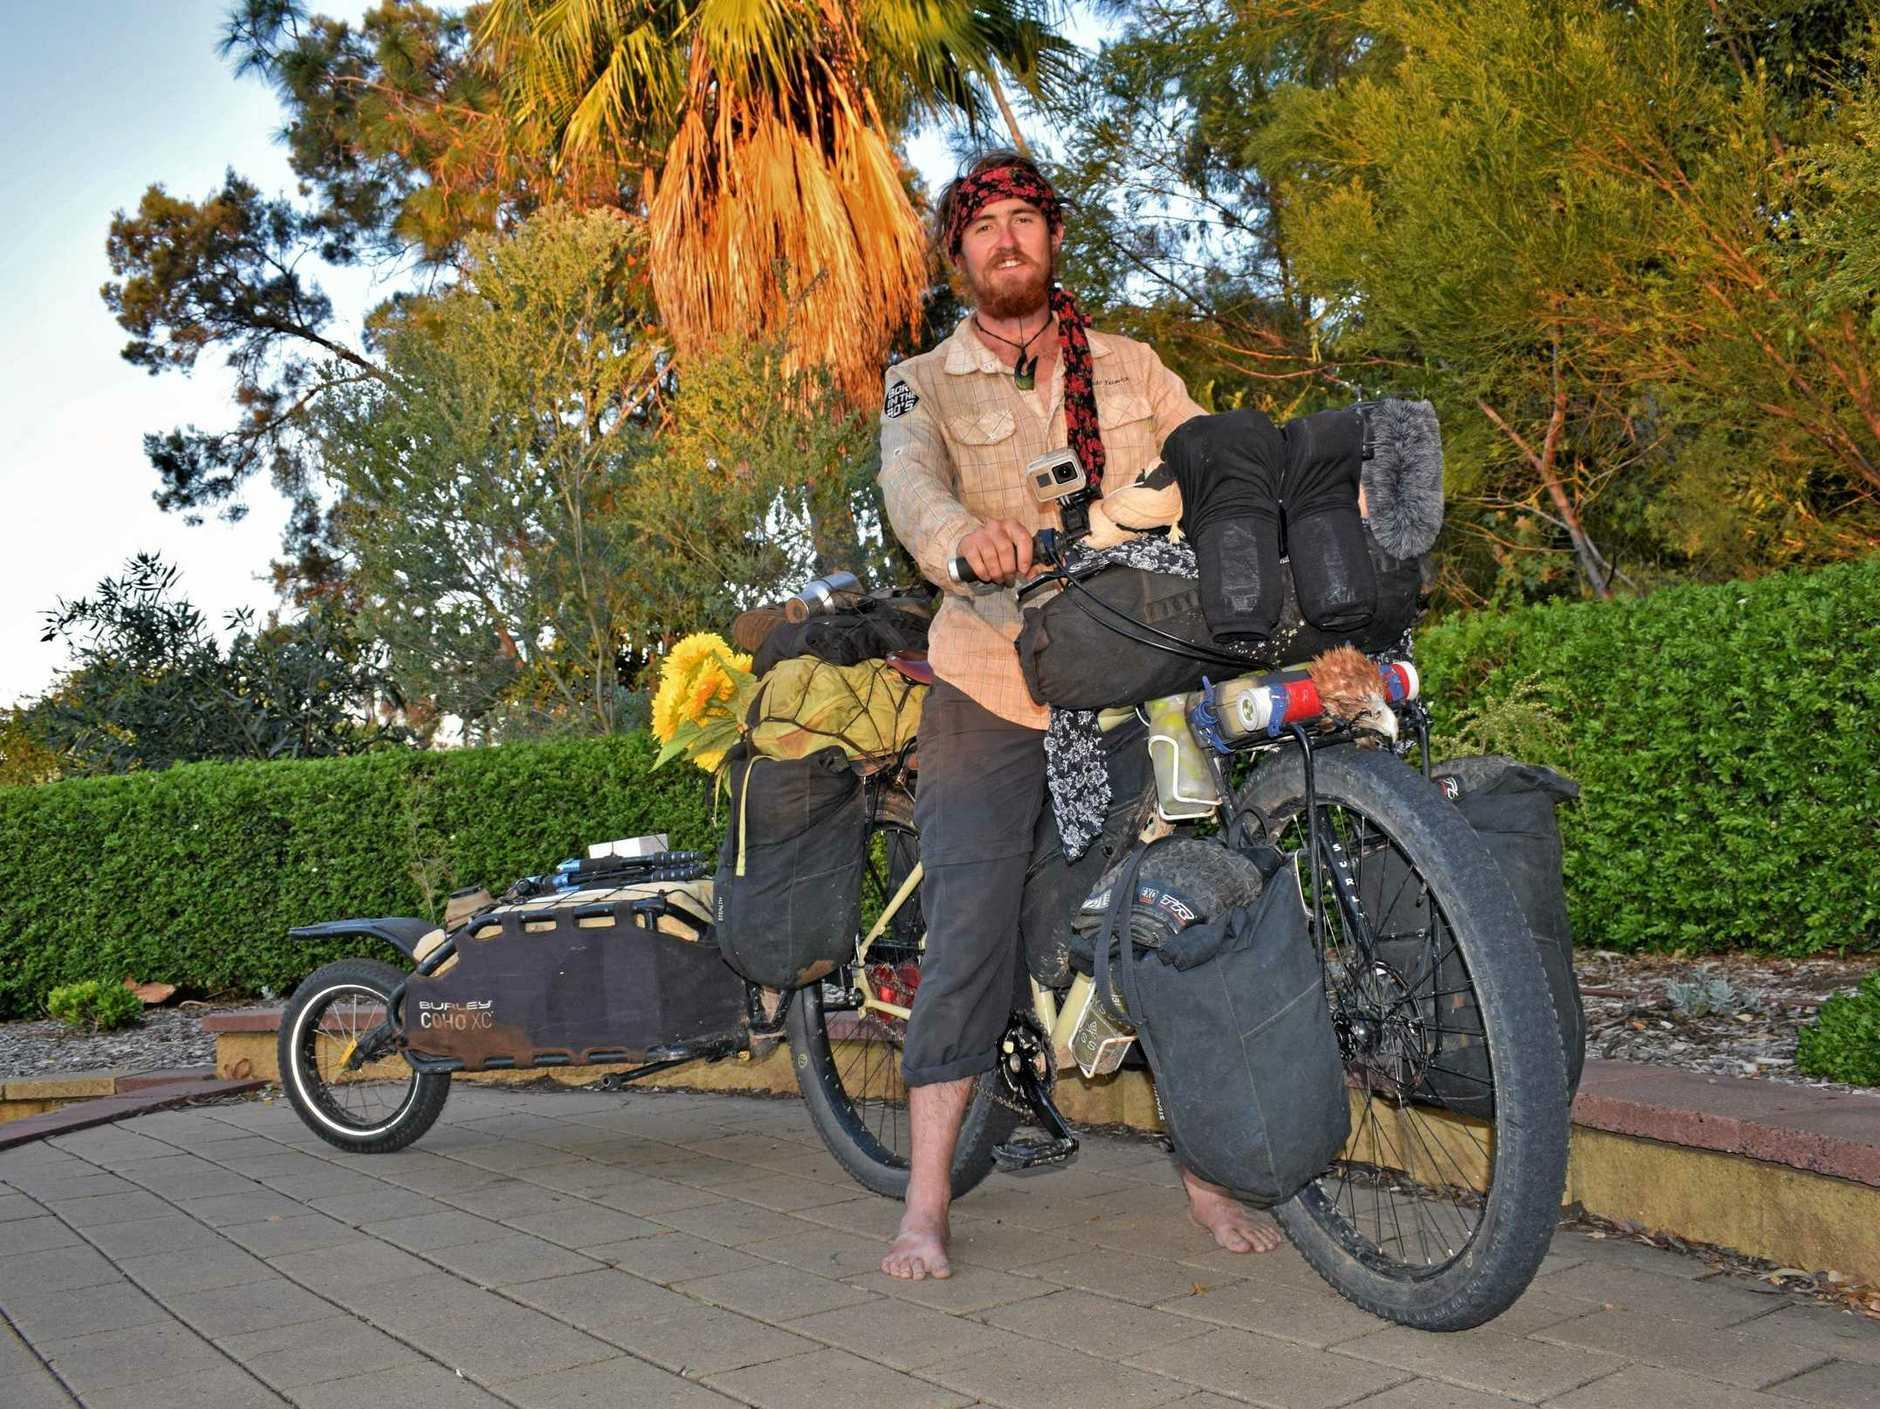 SEASONED ADVENTURER: Brando Yelavich is nearing the end of his 4,670km journey across Australia on a push bike.